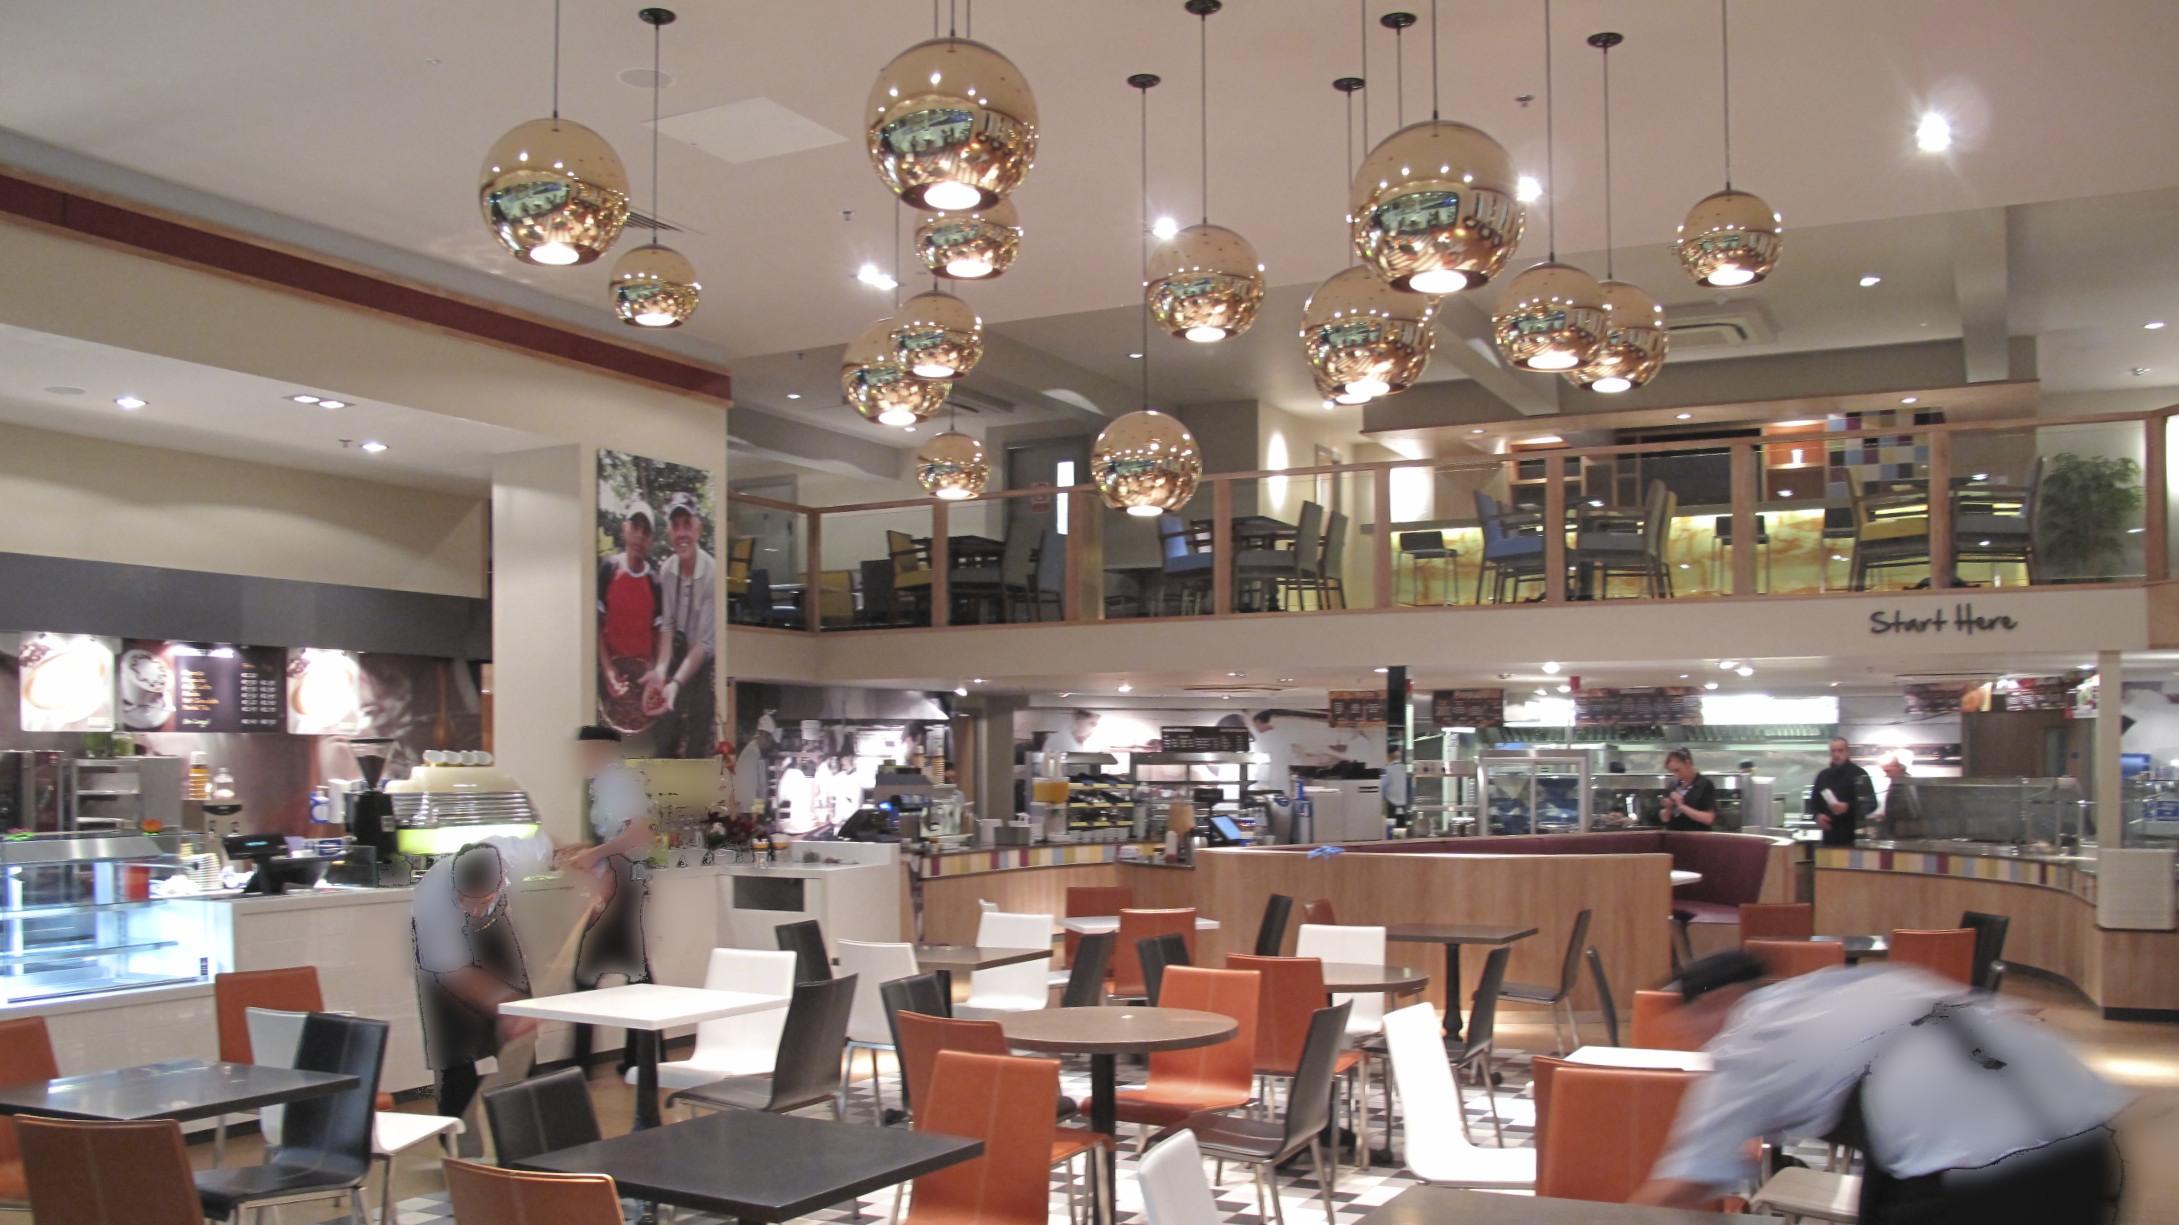 Cafe, Blanchardstown, Dublin